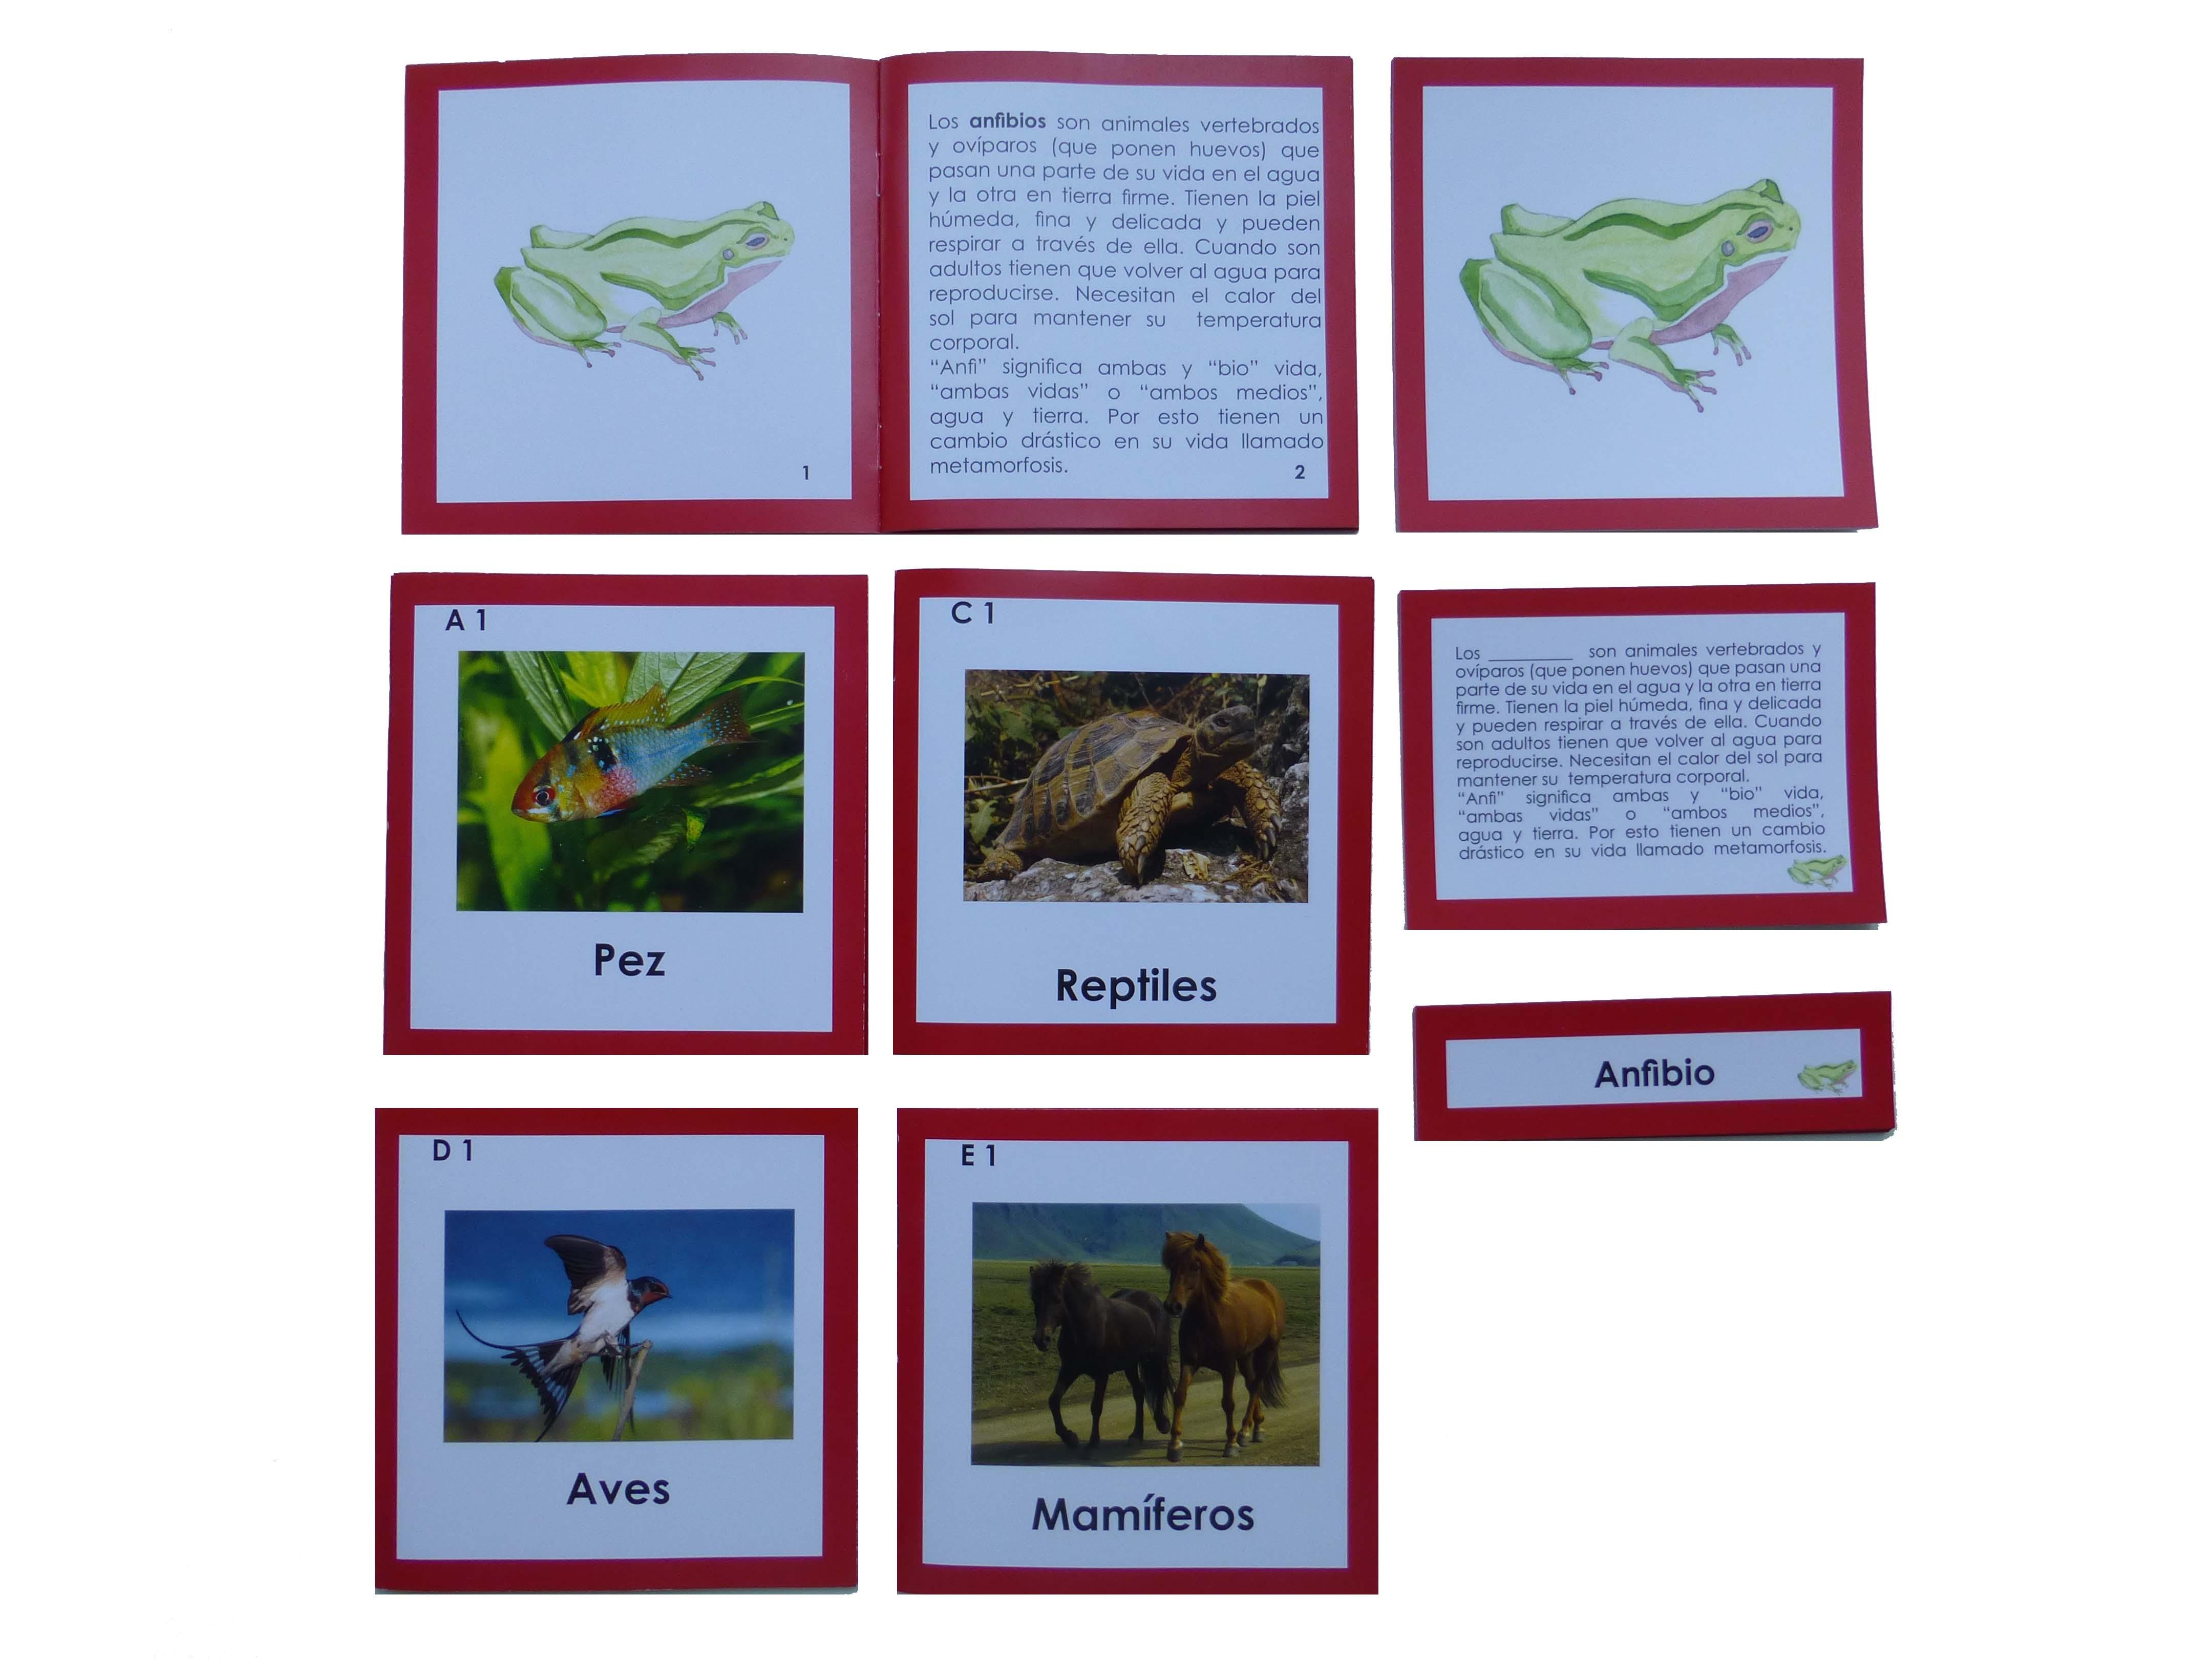 nomenclatura anatomía externa 5 vertebrados